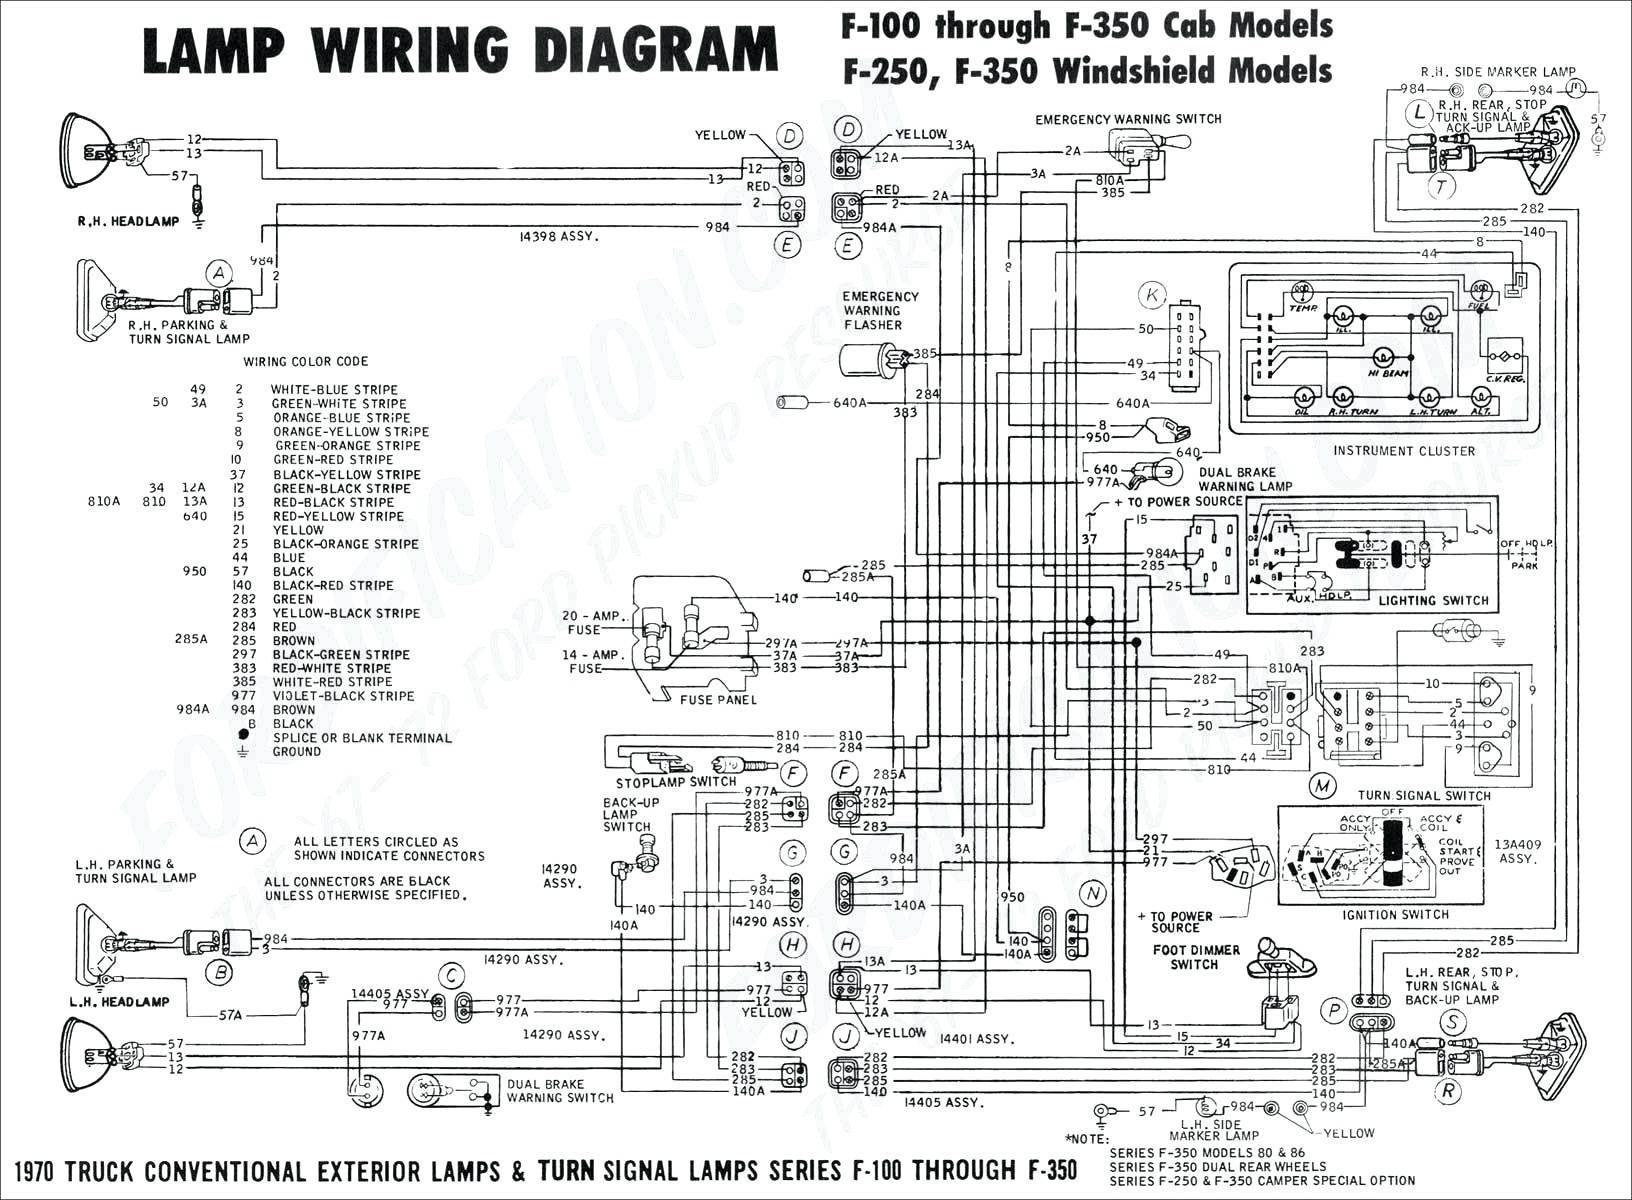 Bogen Paging System Wiring Diagram Wiring Diagram for Alarm System Inspirationa Alarm System Wiring Of Bogen Paging System Wiring Diagram